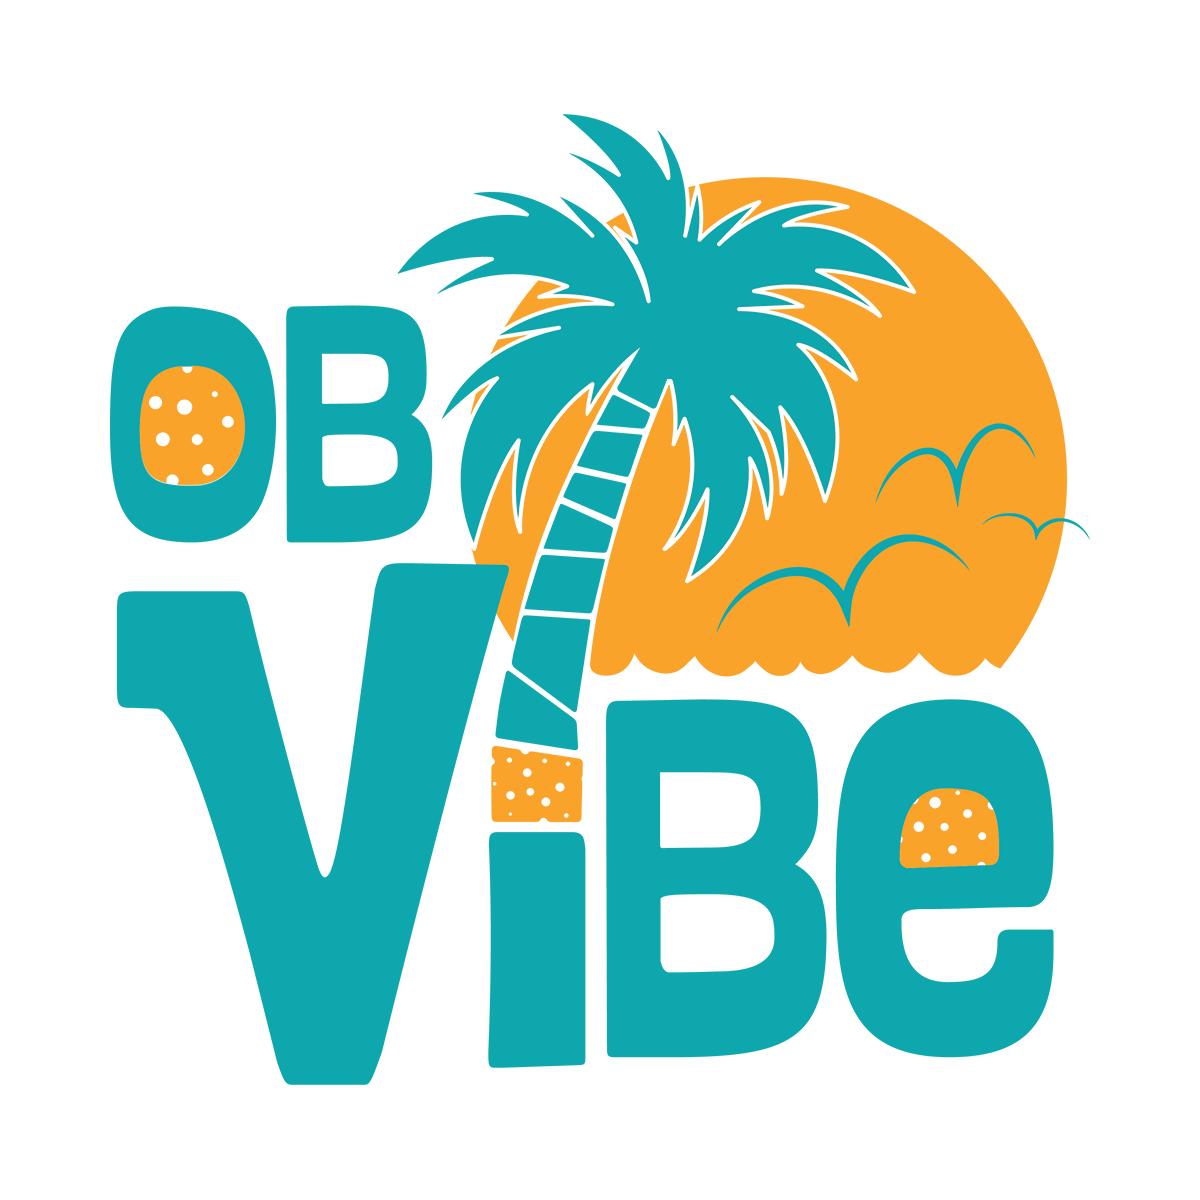 Ocean Beach Product: Celebrate the OB Vibe T-Shirt